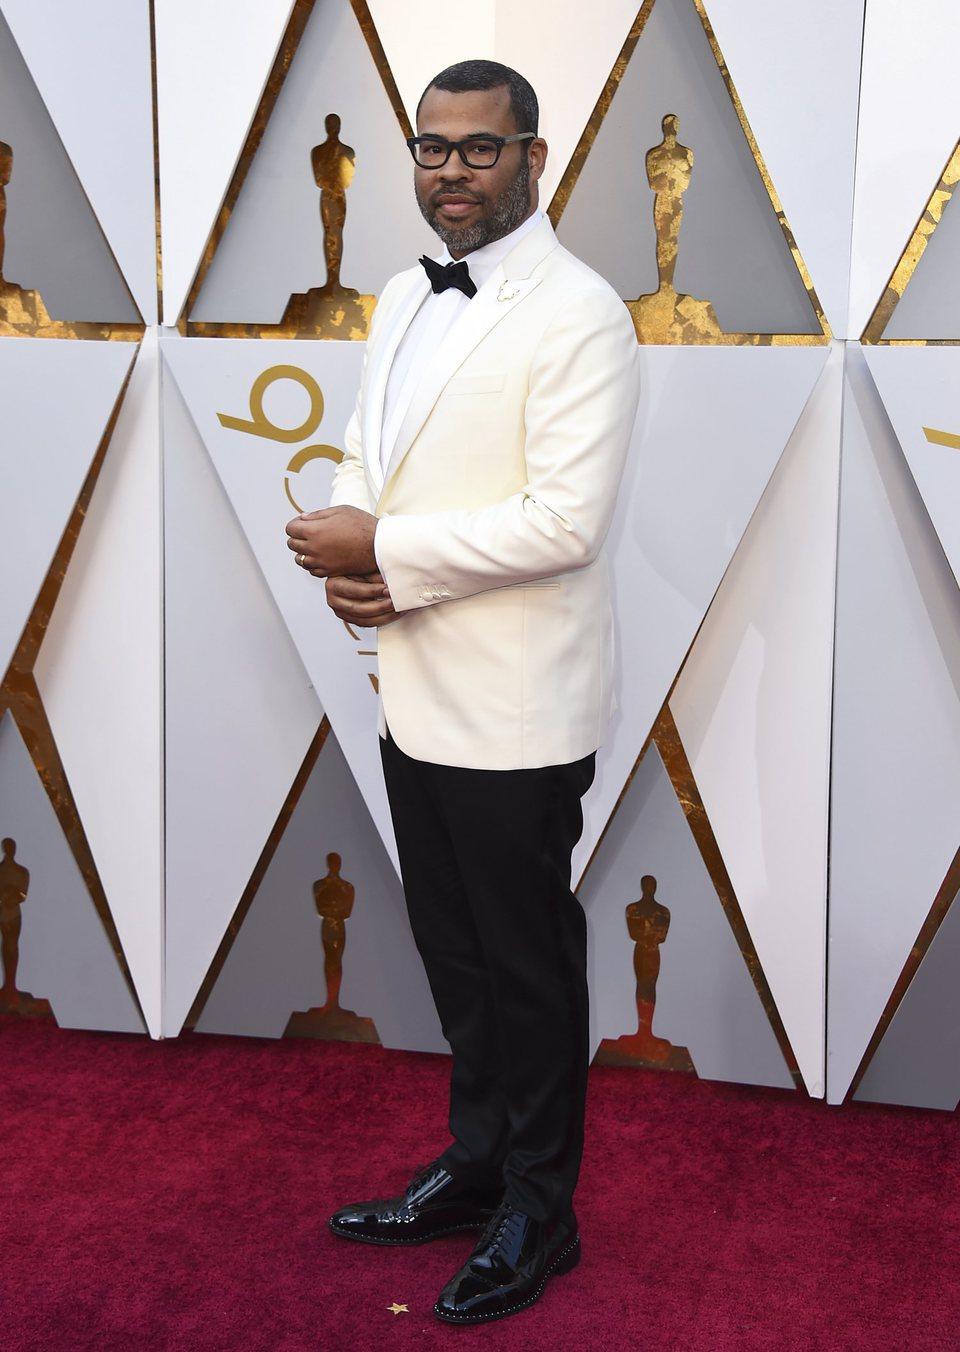 Jordan Peele at the Oscars 2018 red carpet